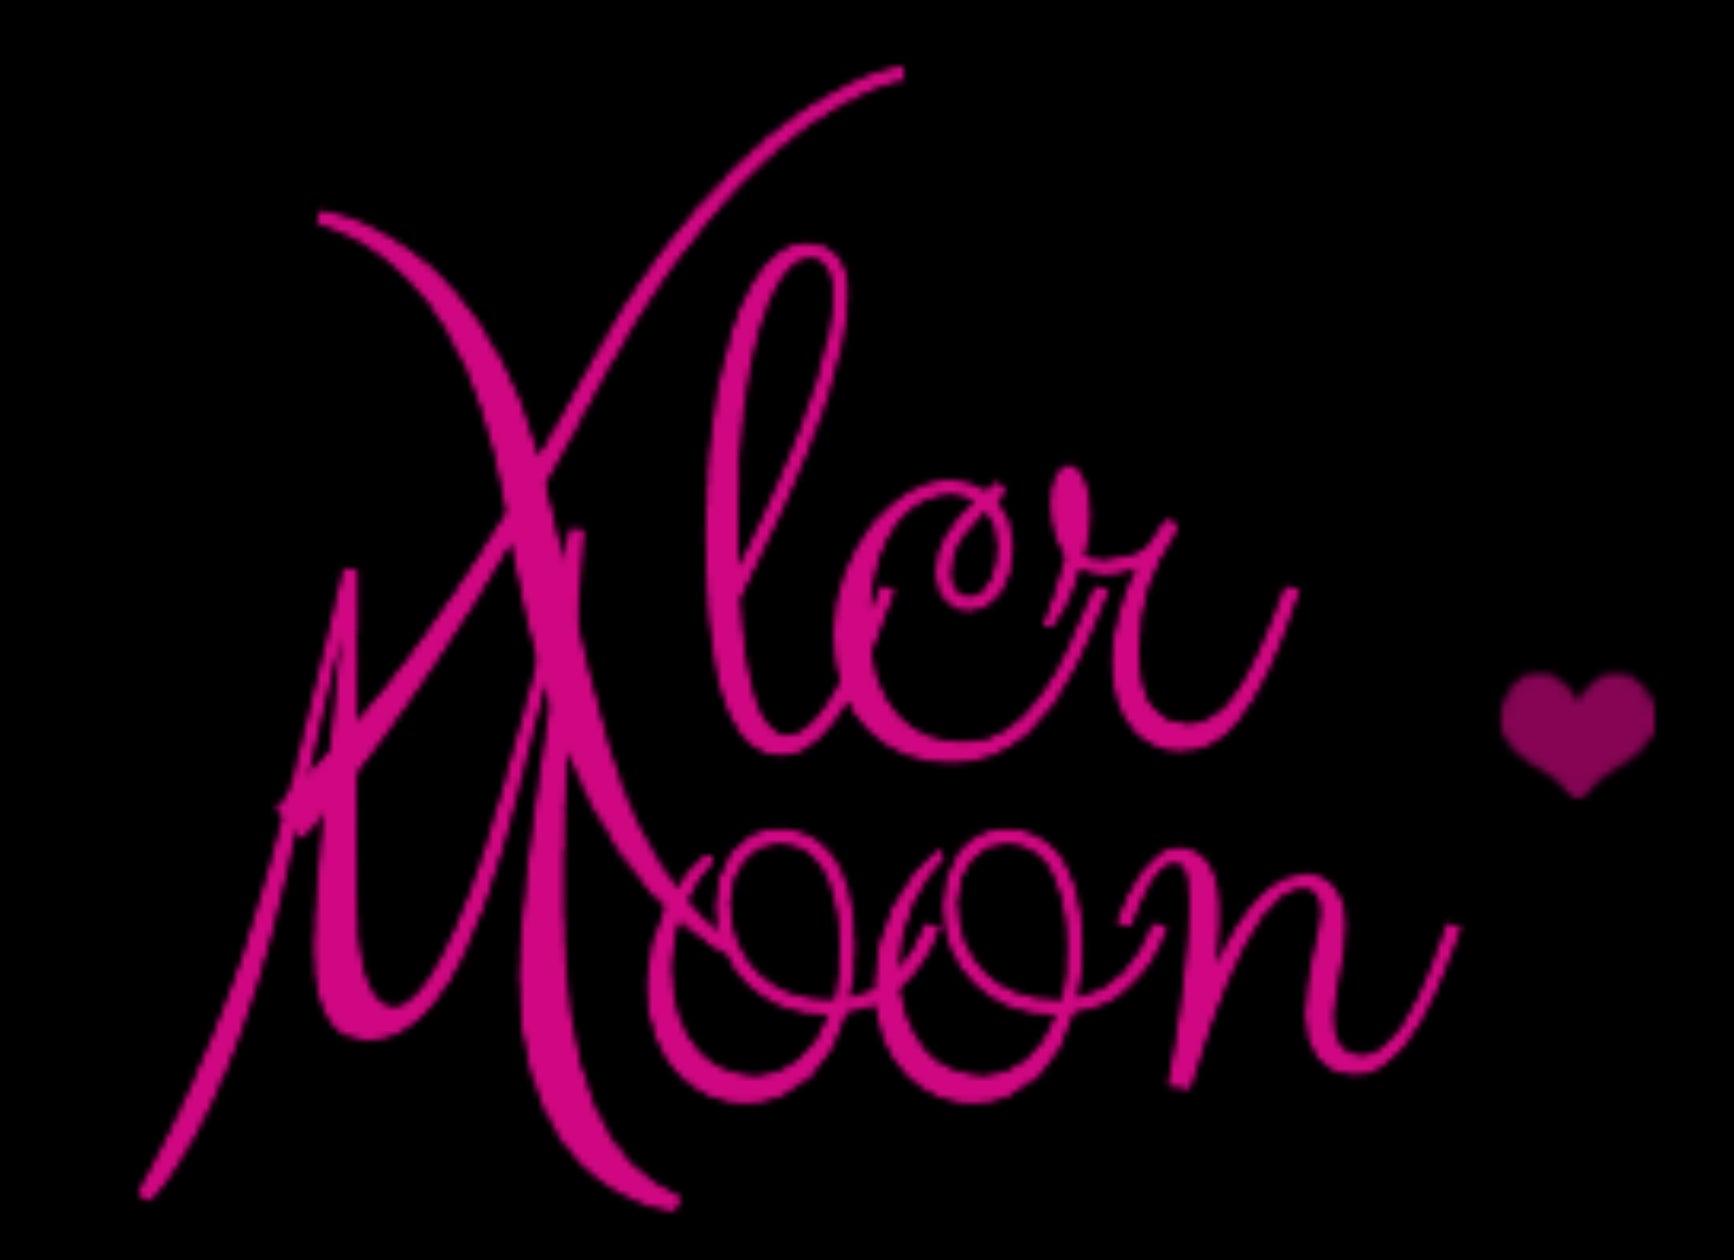 Xlcr Moon